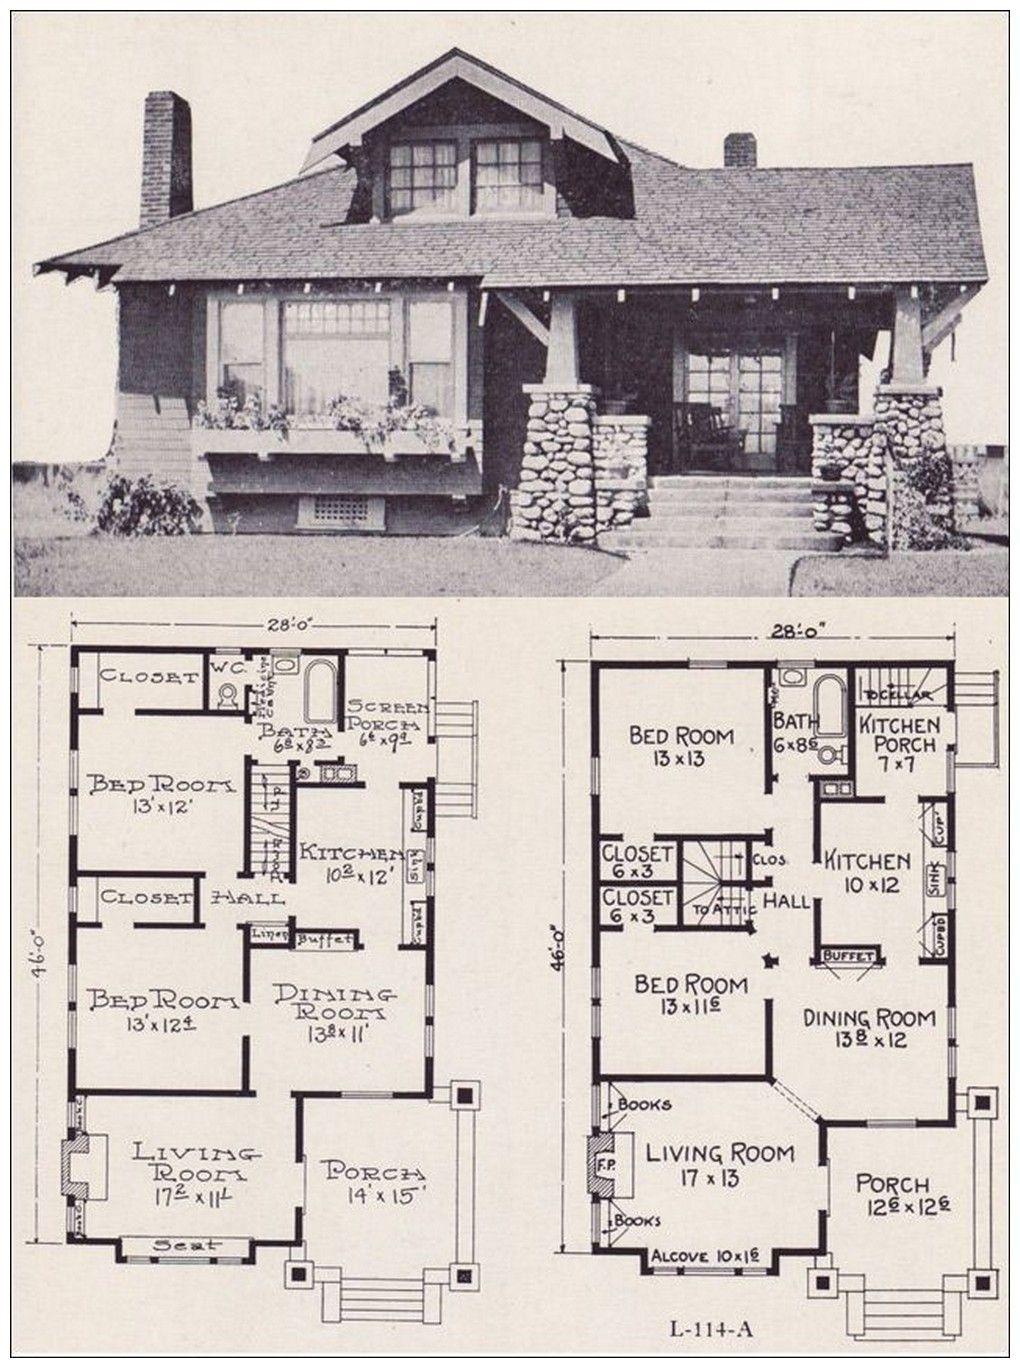 bungalow house plans with bat readvillage 1930s colonial